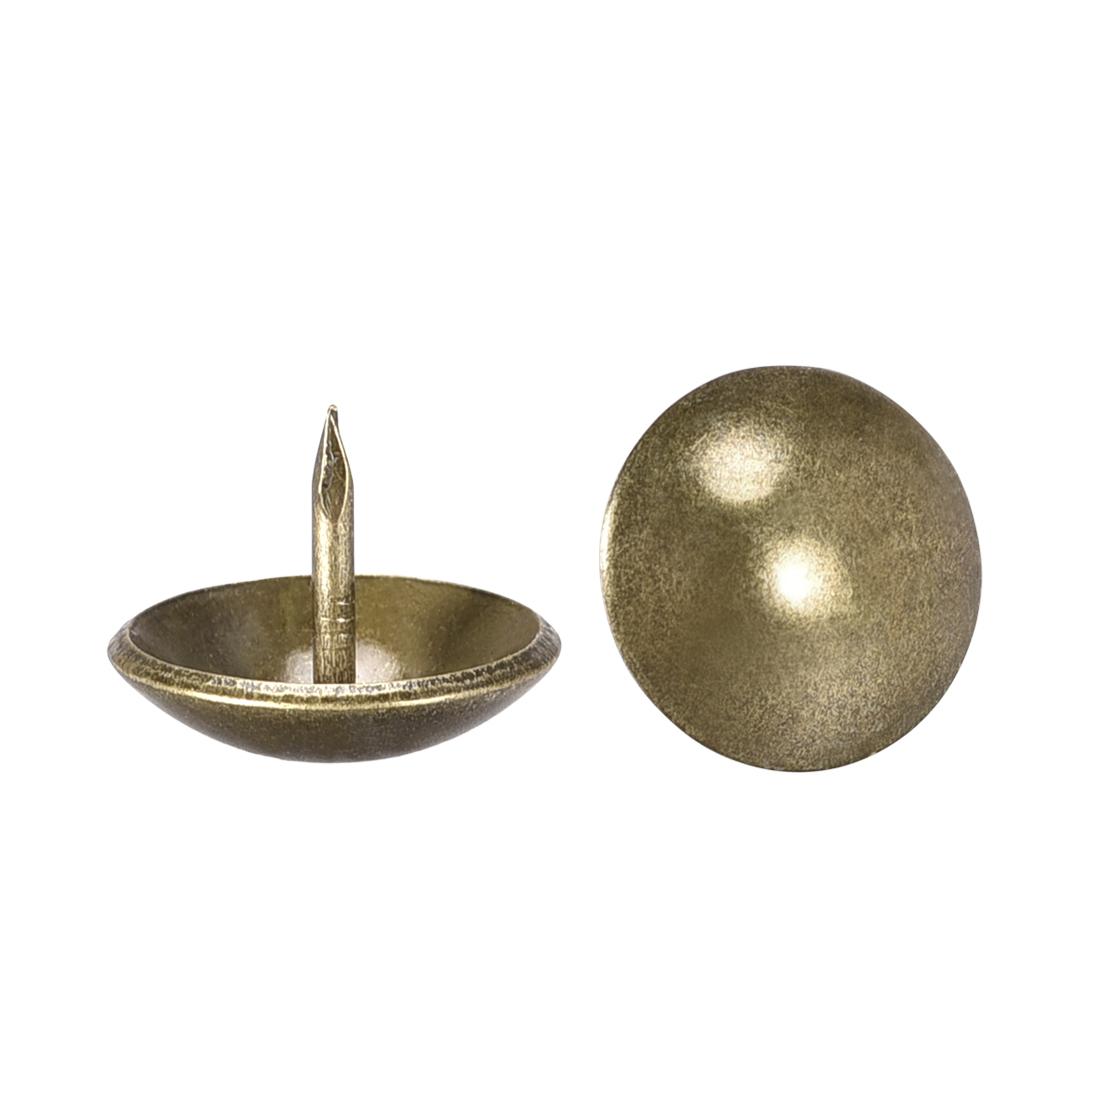 Upholstery Nails Tacks 19mm Dia 15mm Height Round Push Pins Bronze Tone 80 Pcs